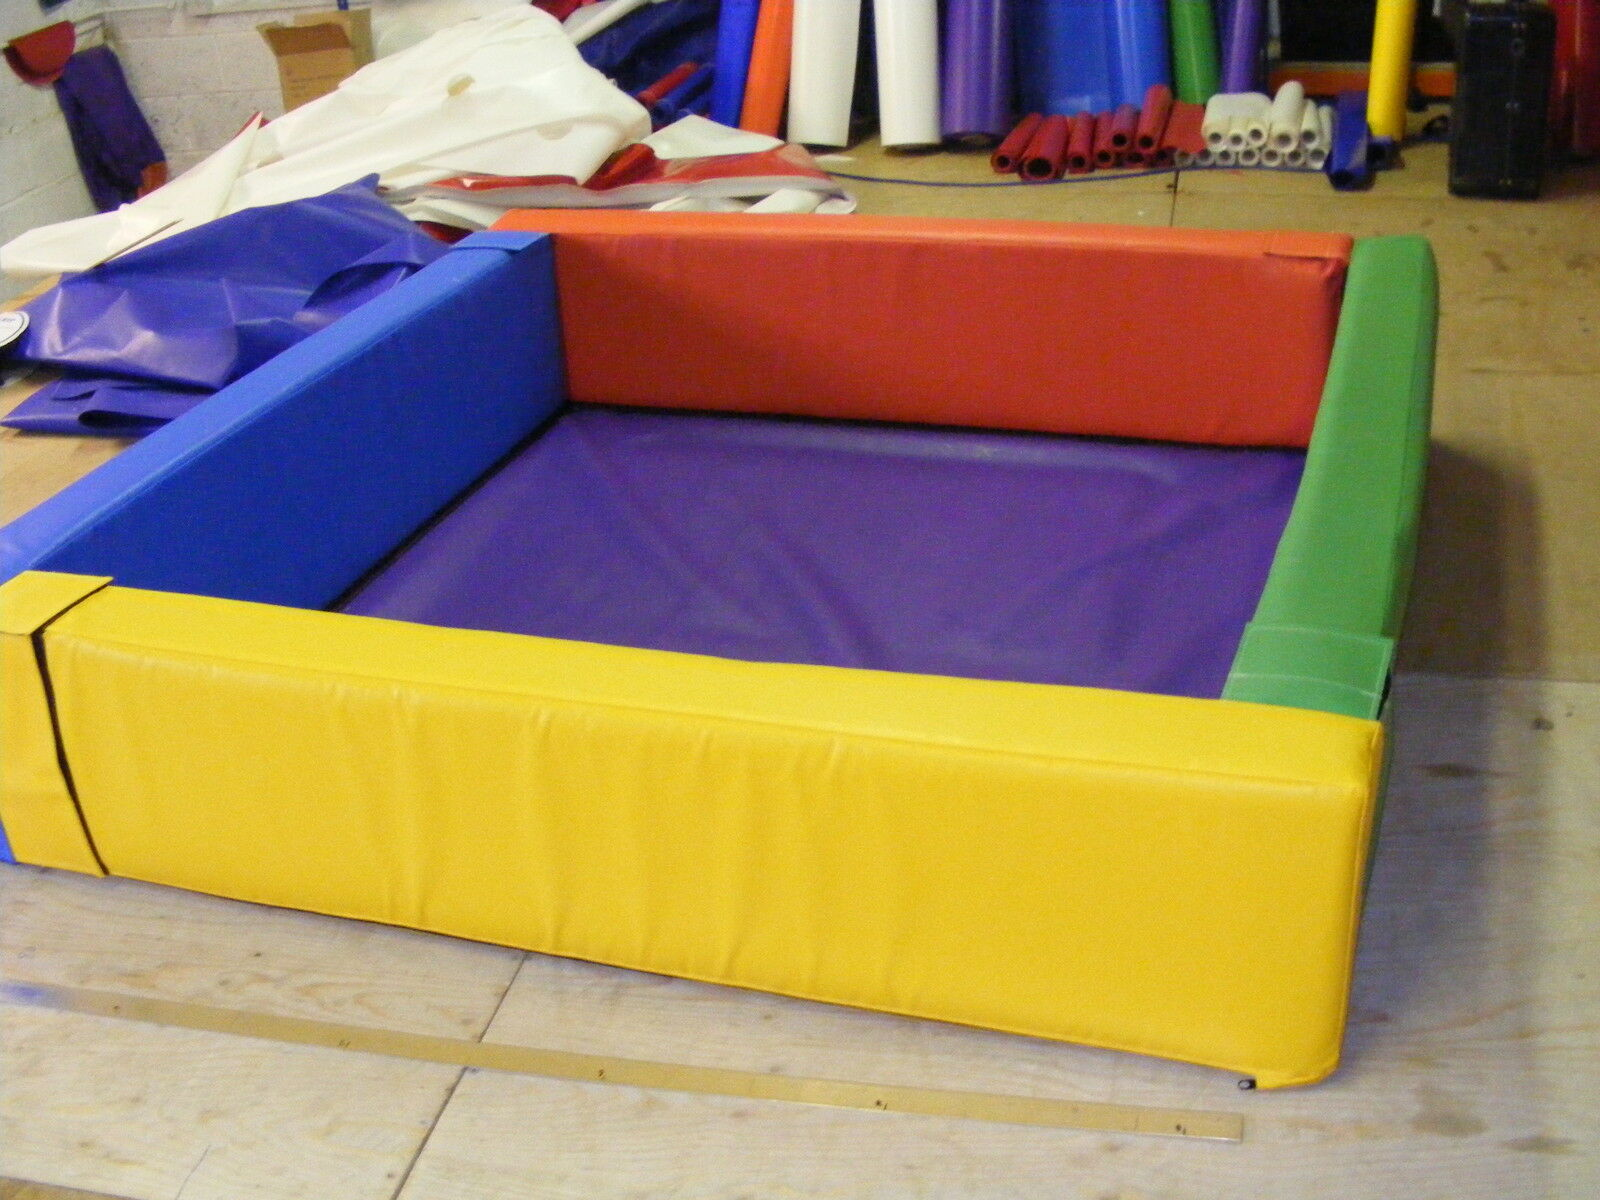 Soft Play Ball Pond 6ft  x 6ft x 18  x 6inch  FREE POST